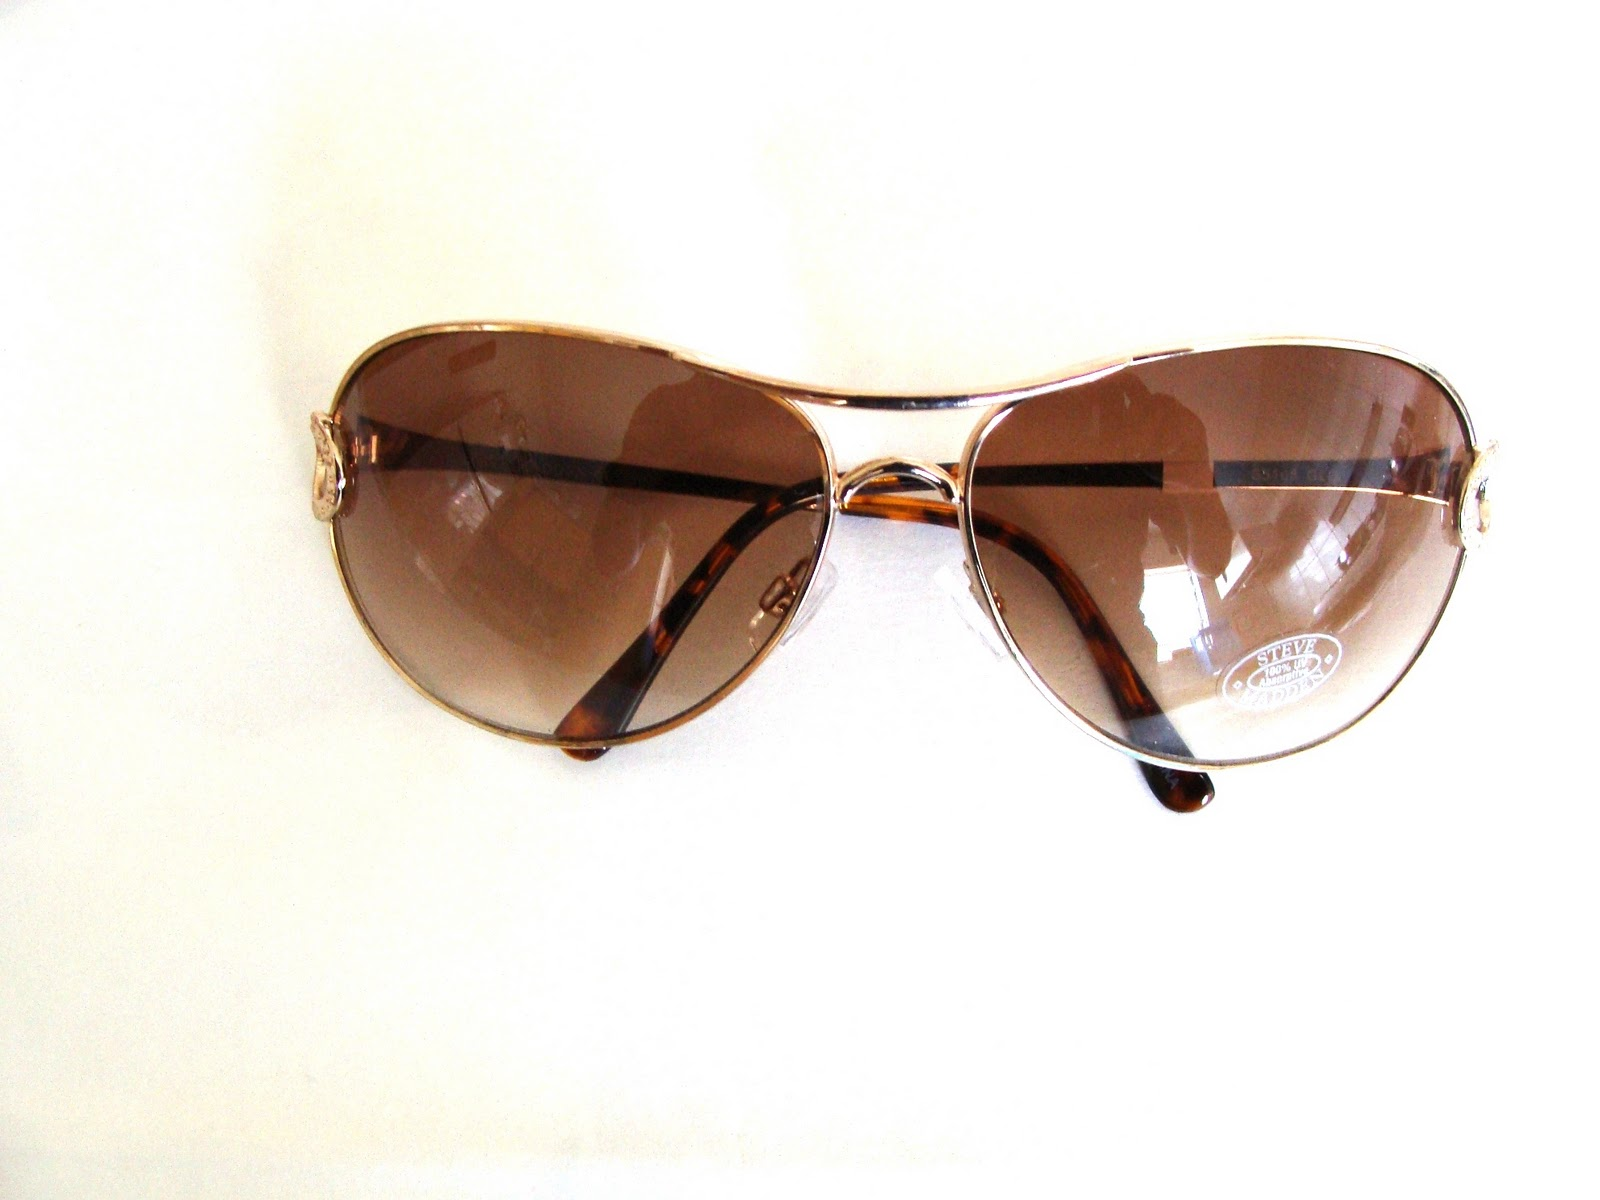 c7264cad1 Etos Importados: Óculos Steve Madden Feminino Cod. SM01